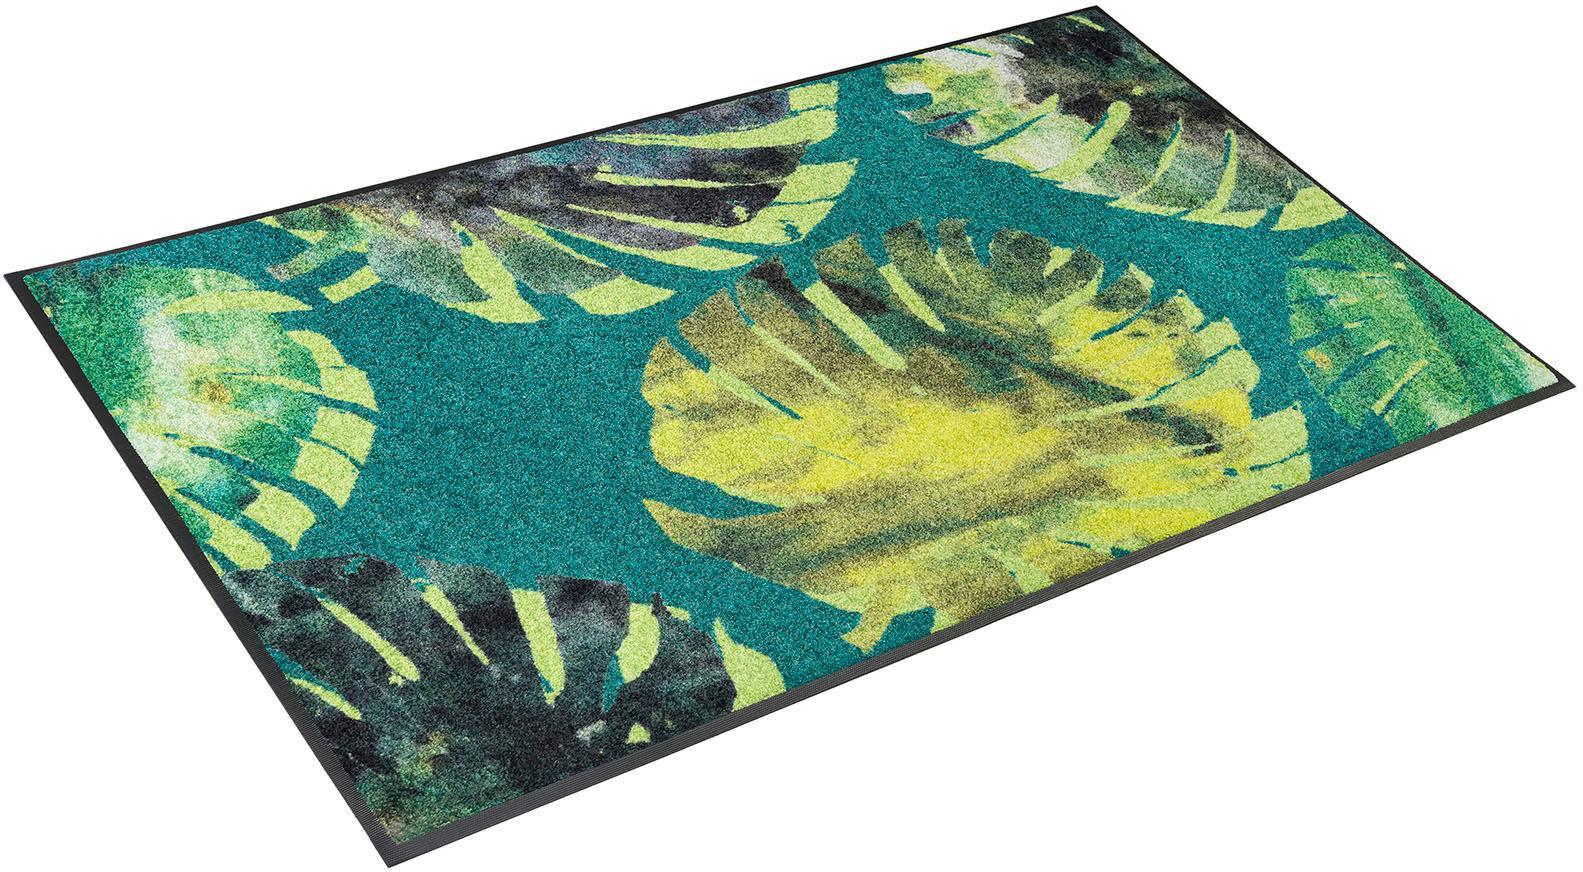 Teppich Philo Leaves wash+dry by Kleen-Tex rechteckig Höhe 7 mm gedruckt